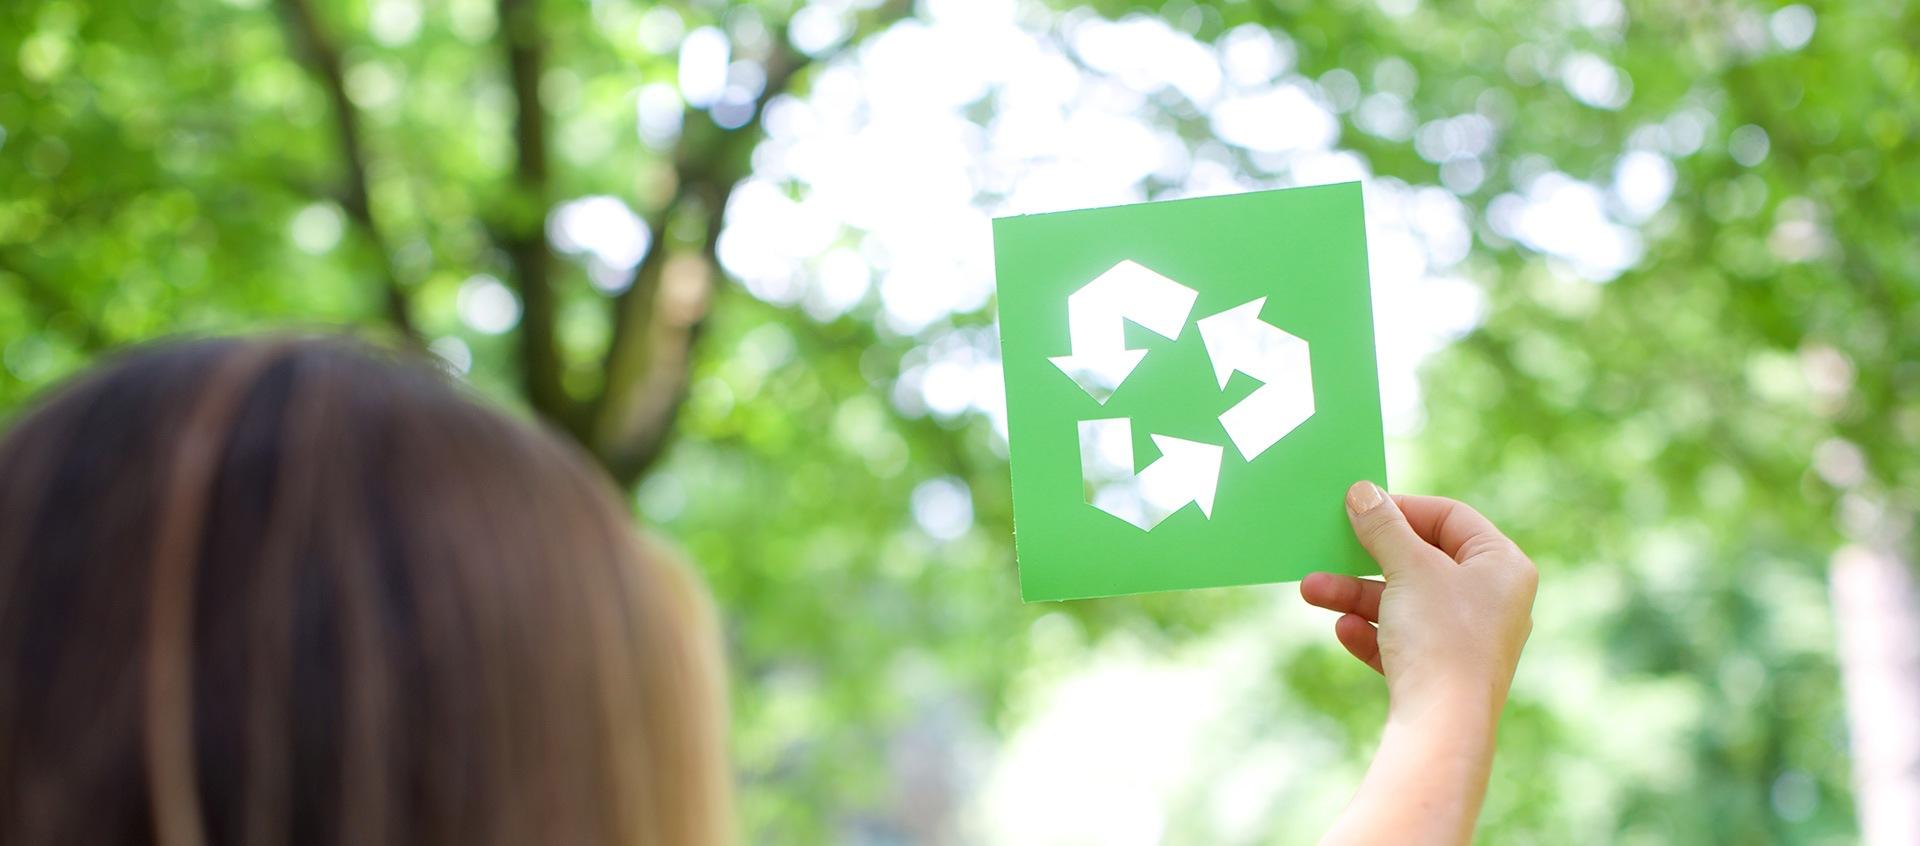 Green Ambiente